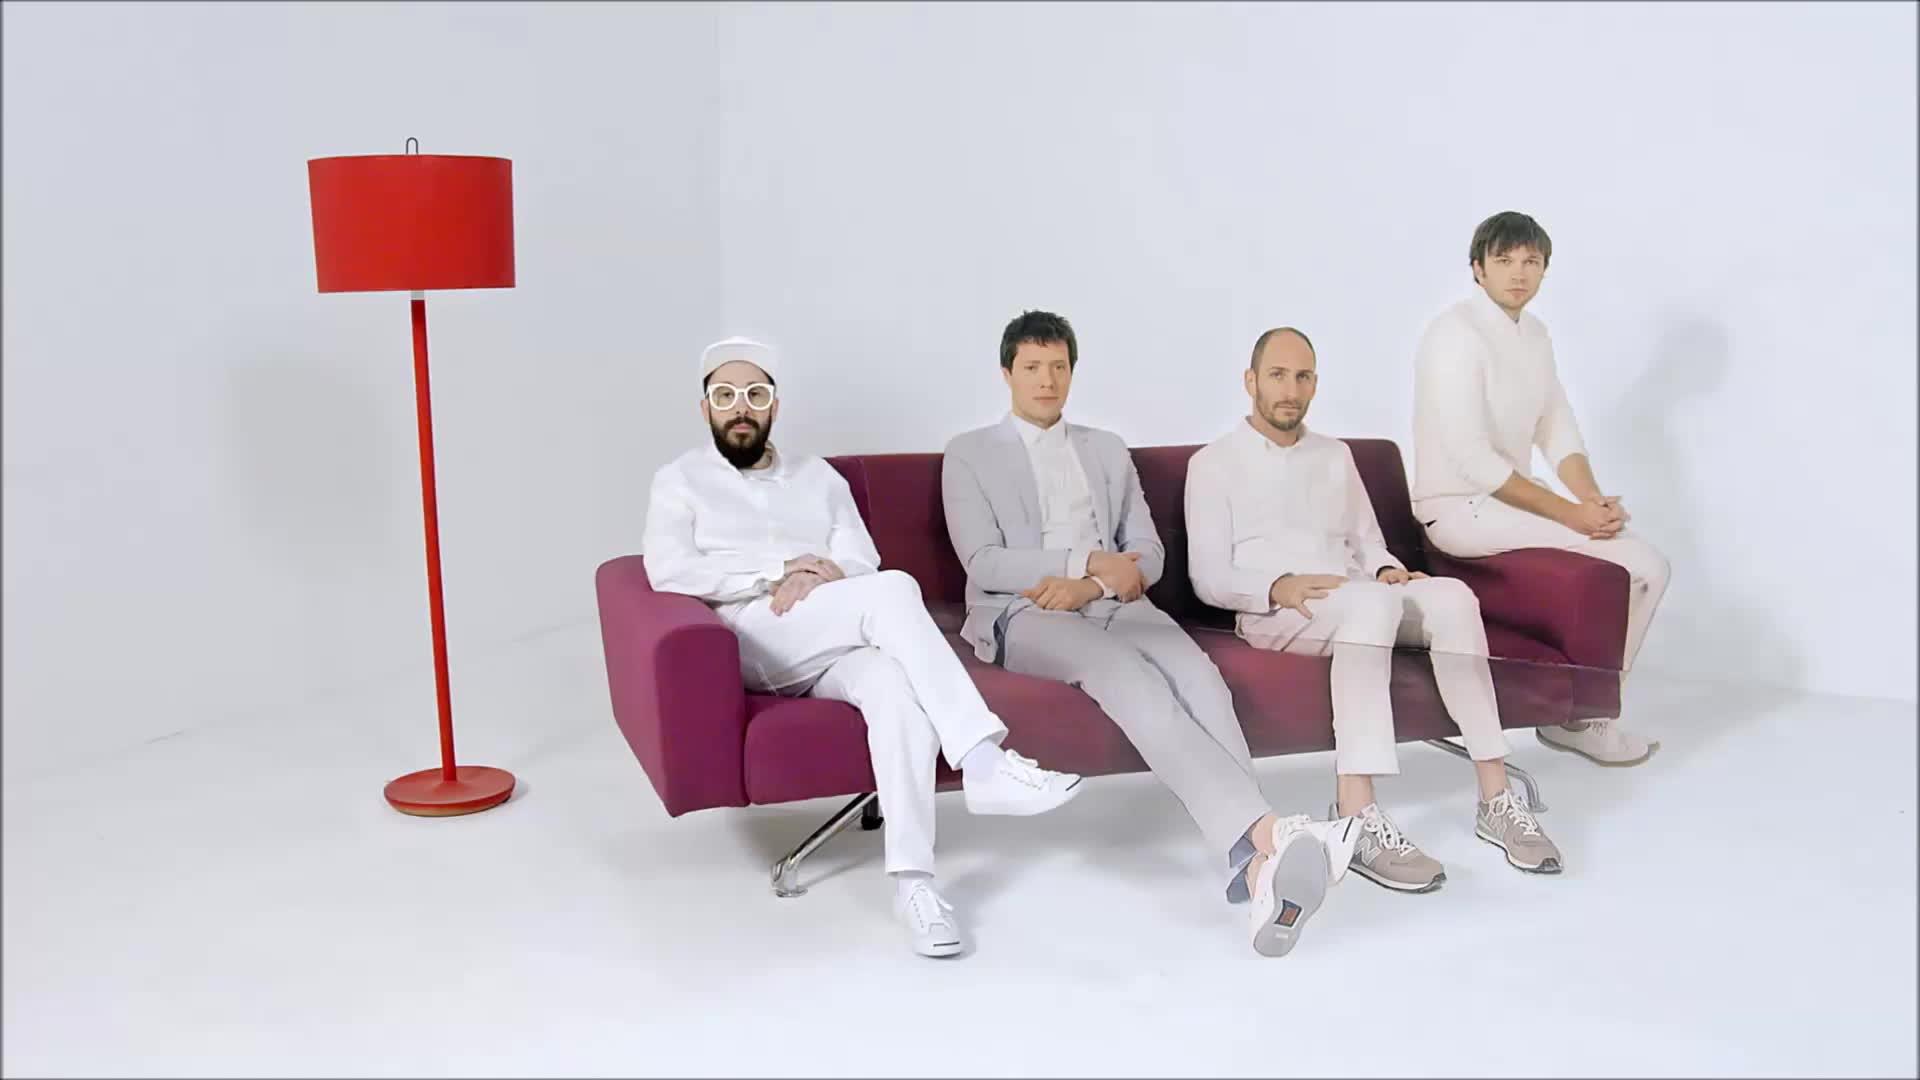 macaline, music, ok go, okgo, red star macalline, star, Red Star Macalline - OK Go GIFs